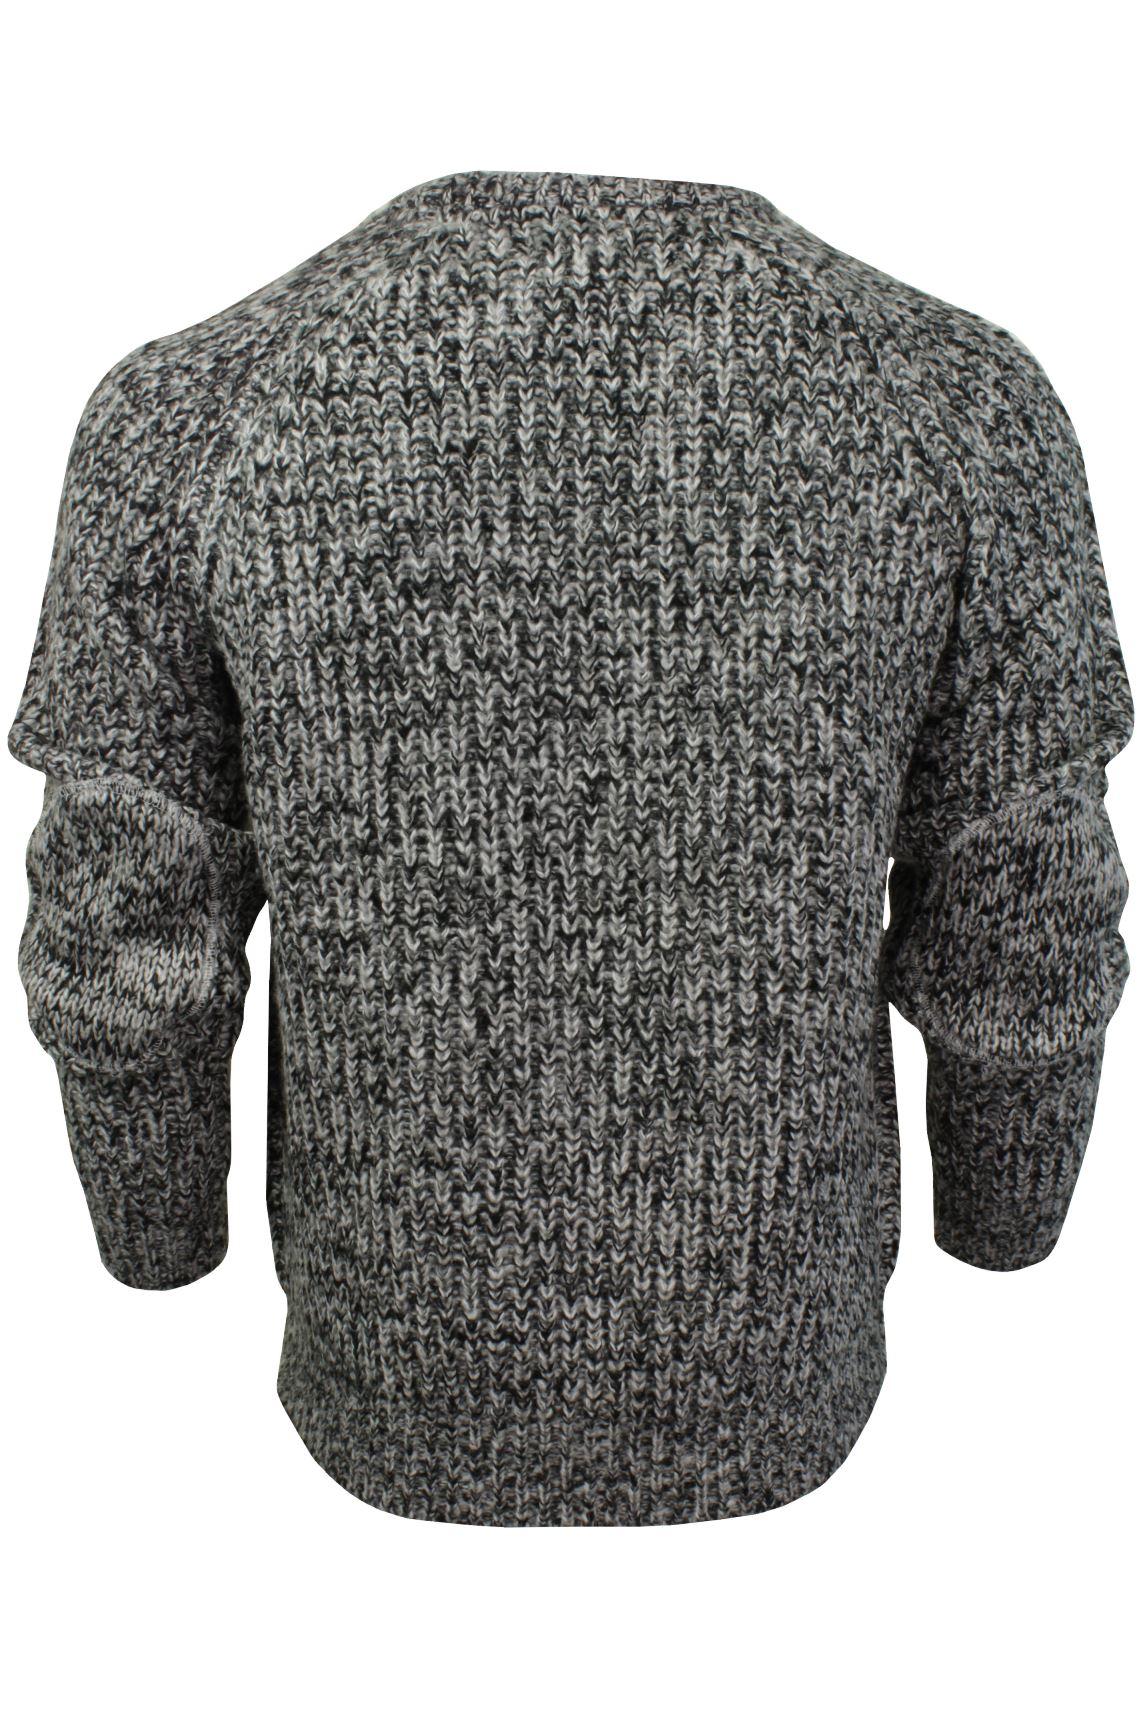 Xact-Mens-Jumper-Fashion-Chunky-Fisherman-Fleck-Knit-Long-Sleeve thumbnail 5